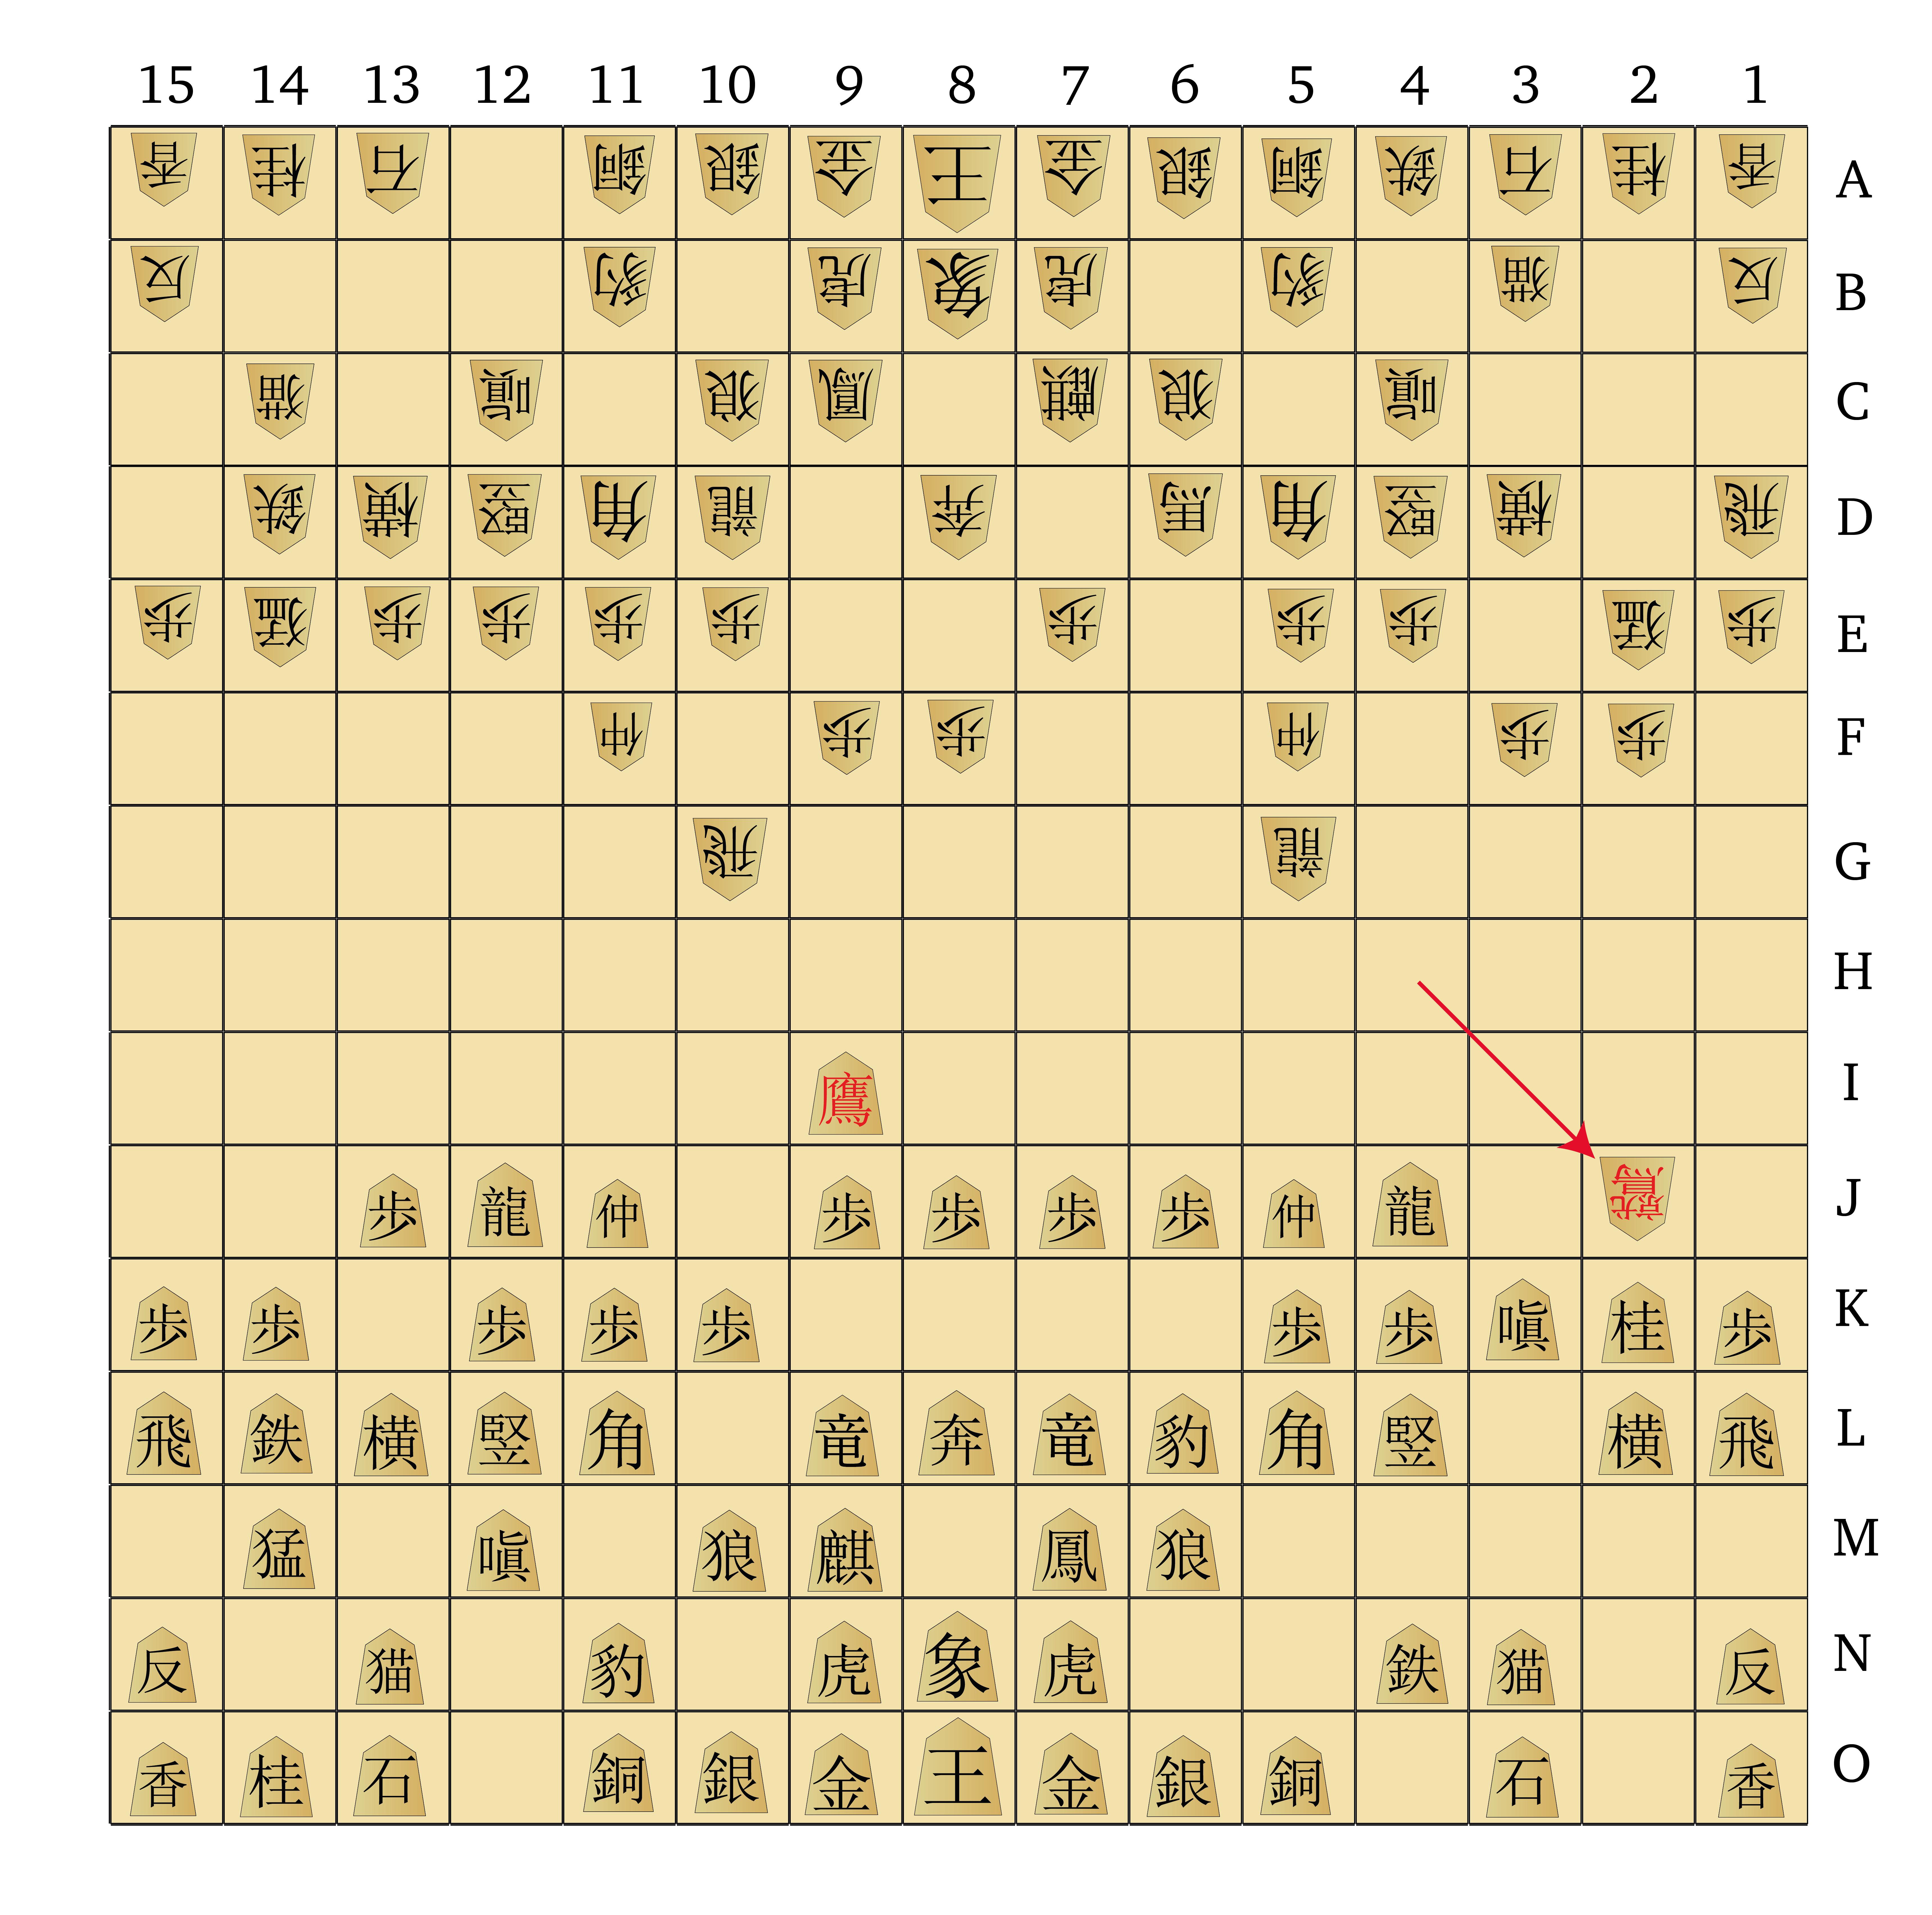 Dai Shogi 420 -- Move 70-01